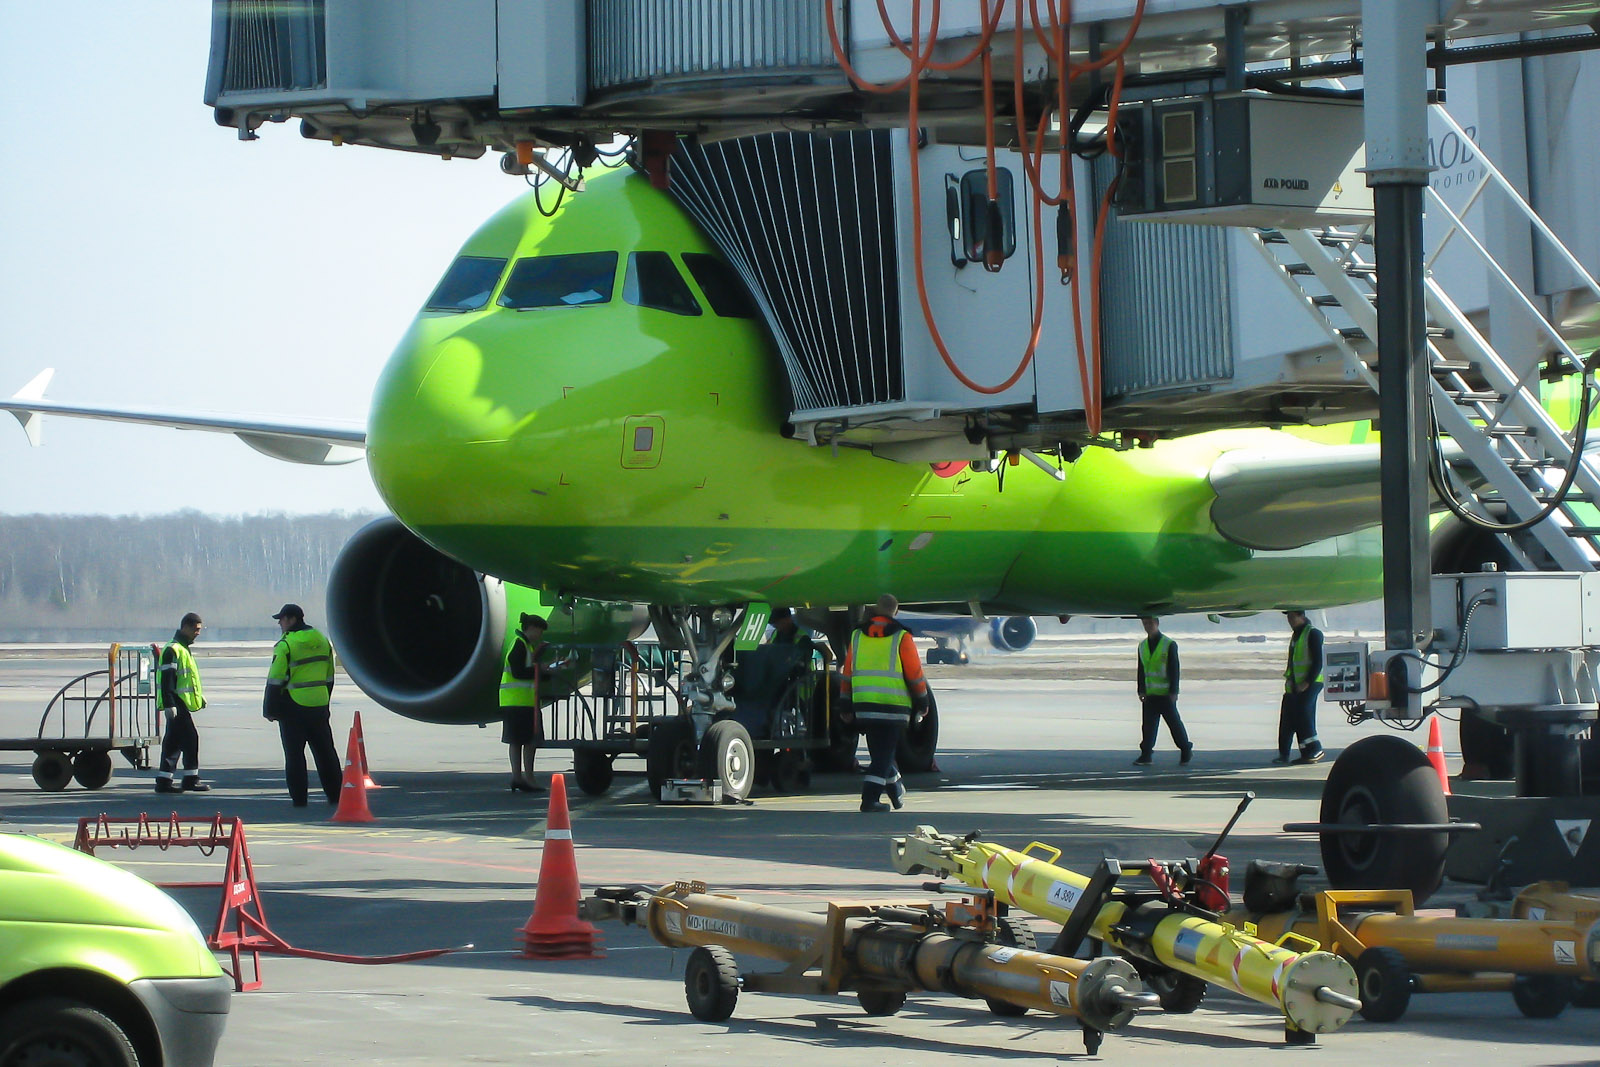 Подготовка Airbus A319 авиакомпании S7 Airlines в аэропорту Домодедово